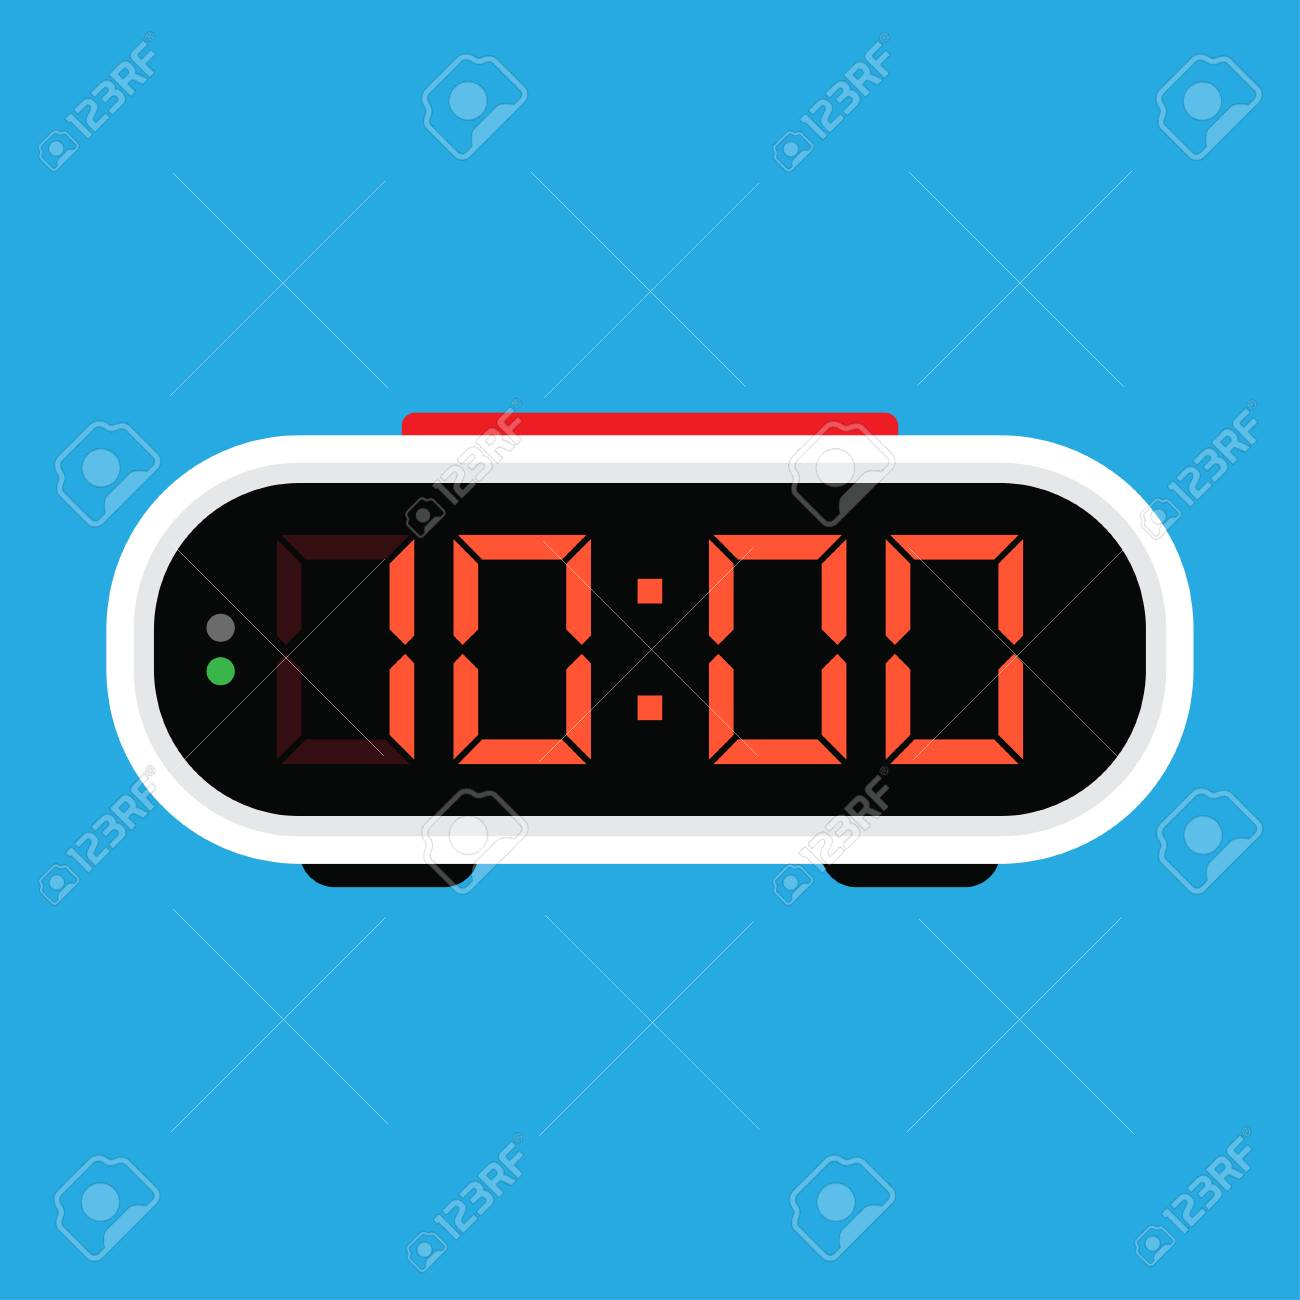 Digital alarm clock icon. Vector Illustration, on blue background - 102991197